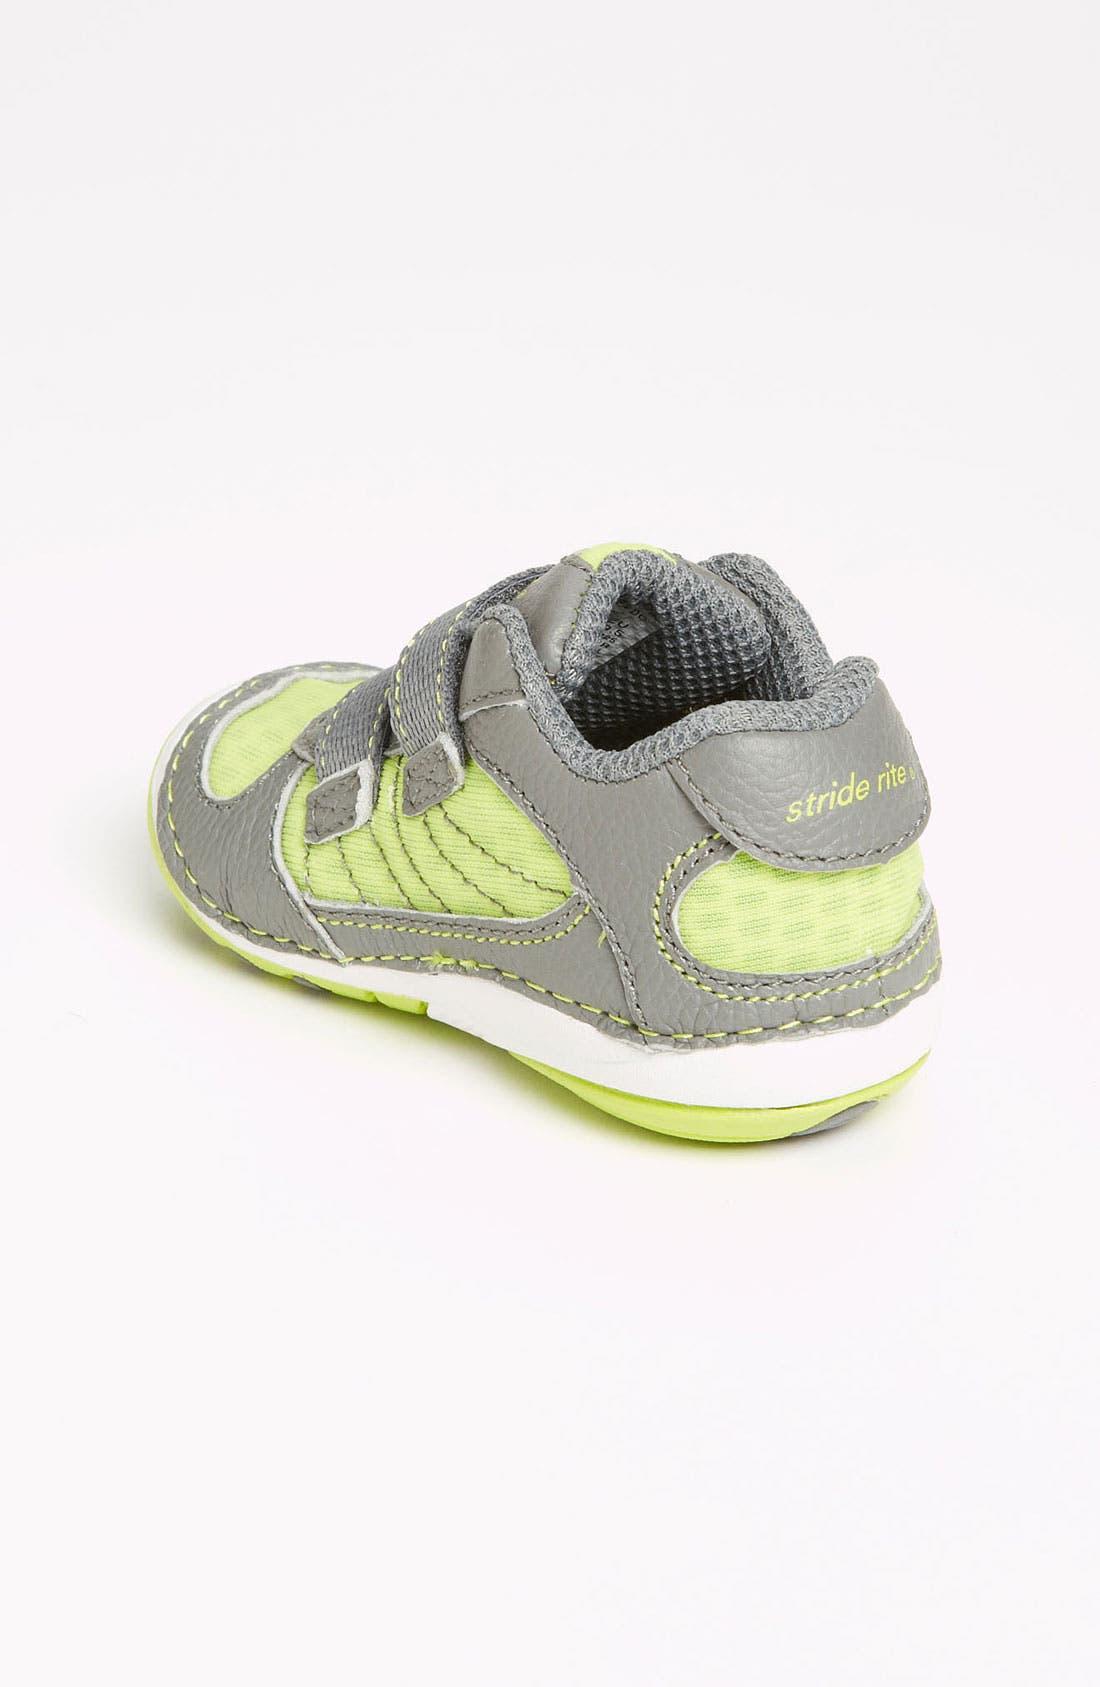 Alternate Image 2  - Stride Rite 'Ronaldo' Sneaker (Baby & Walker)